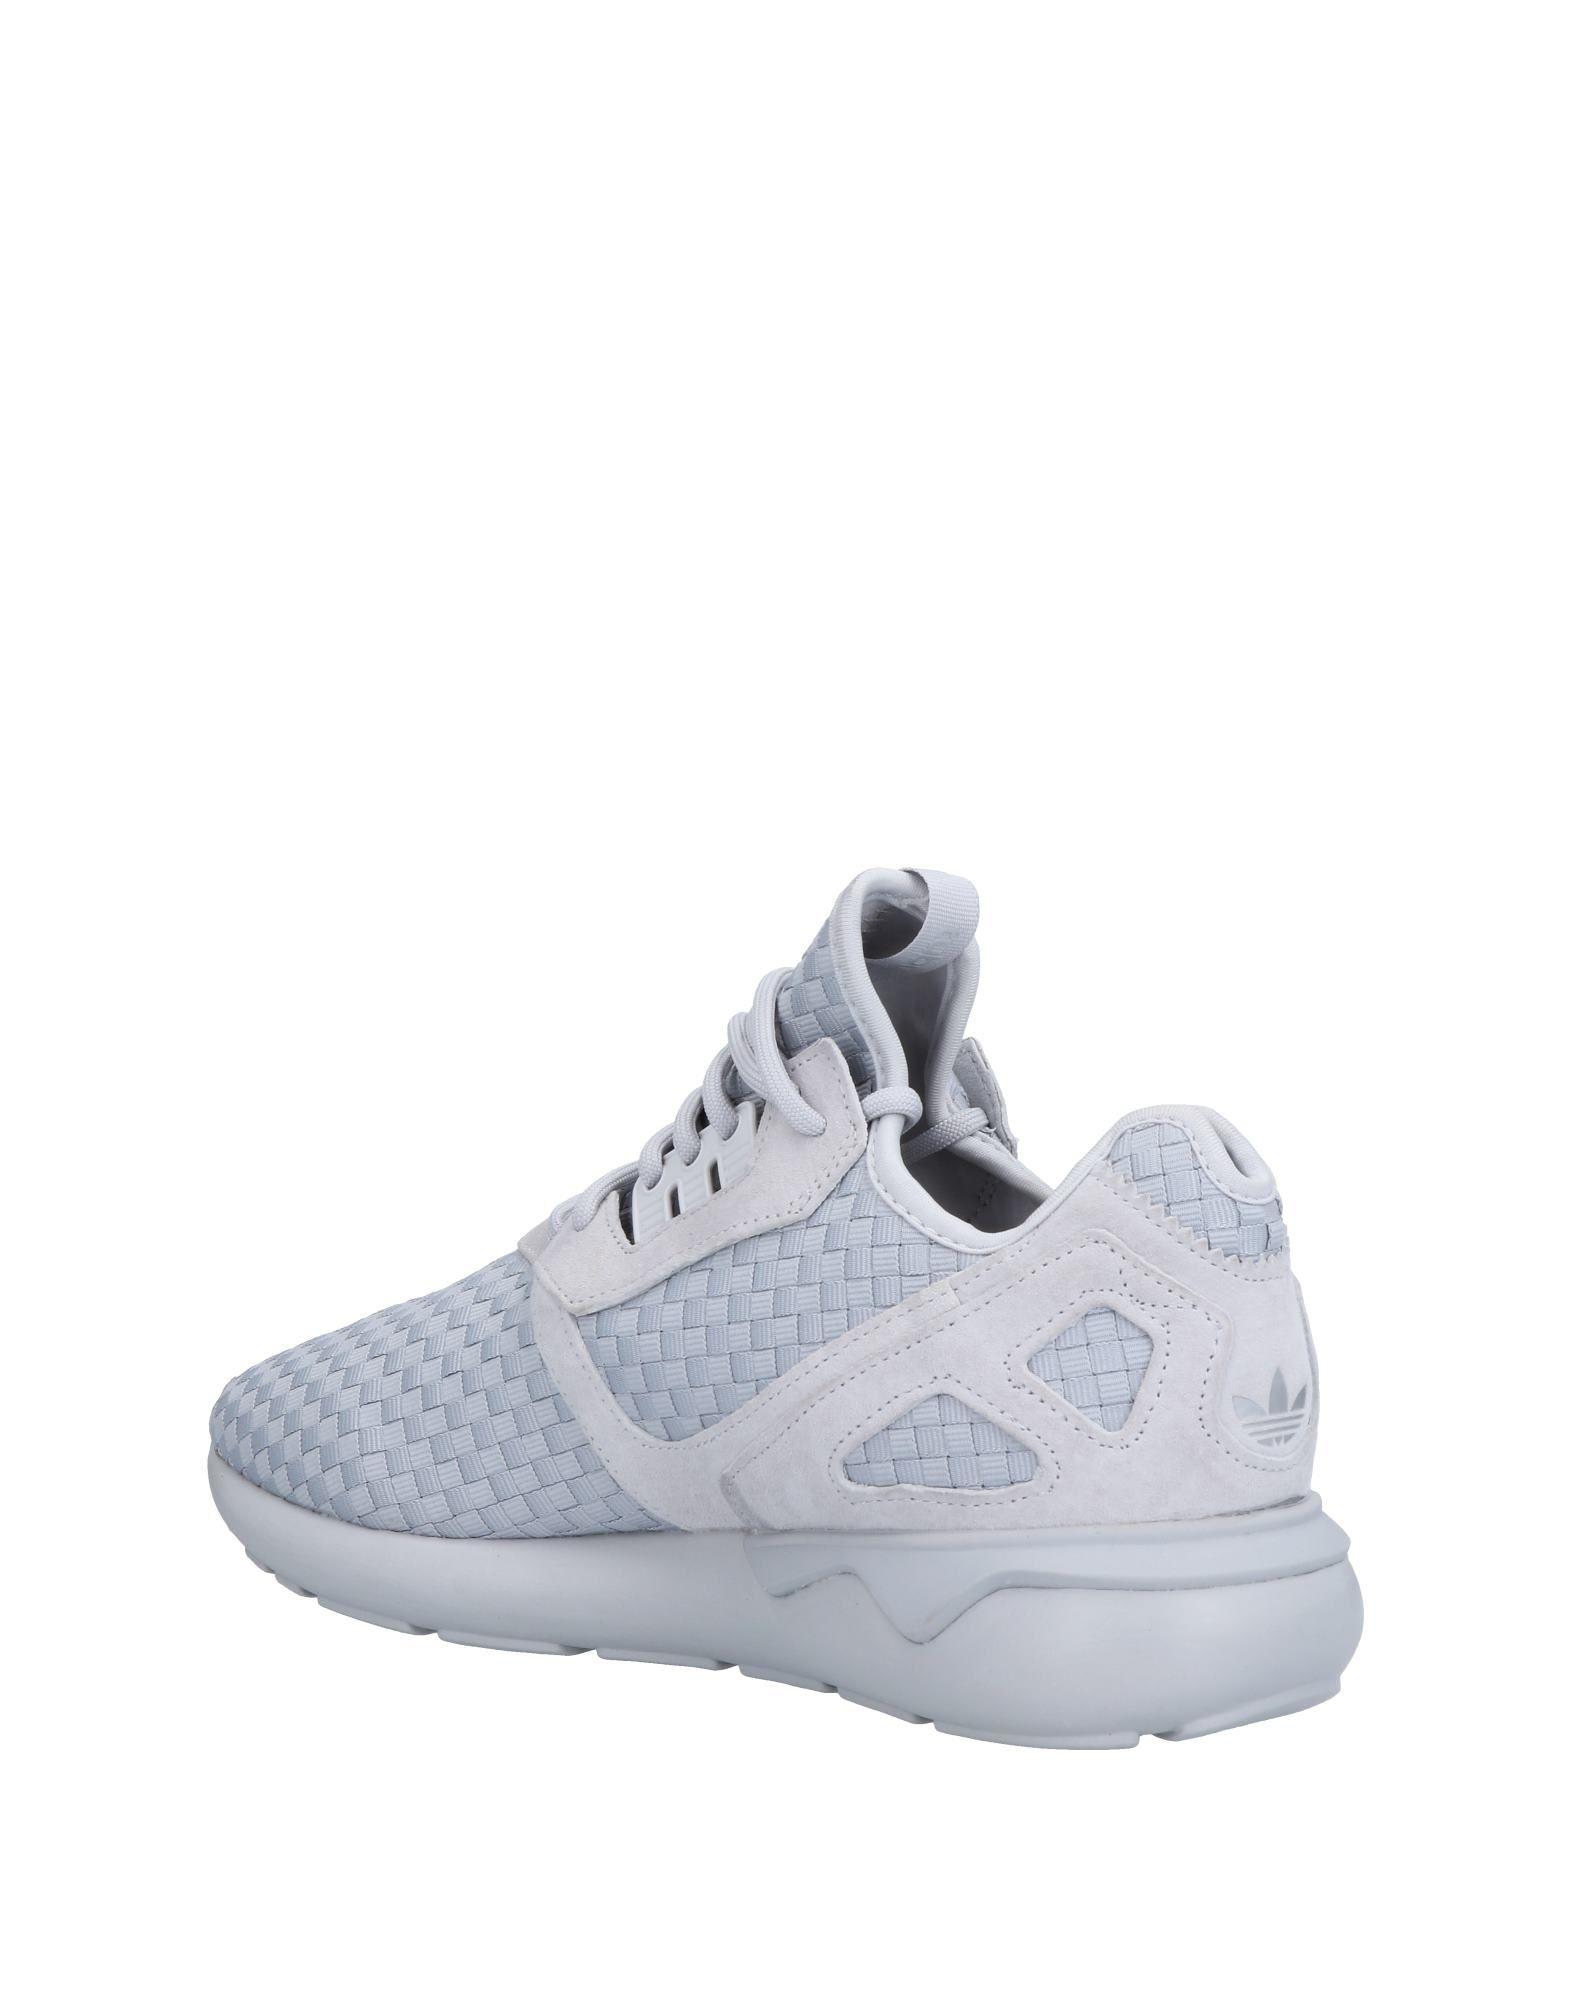 Adidas Originals Sneakers Sneakers Sneakers - Men Adidas Originals Sneakers online on  Australia - 11486428IV 0bbeb0